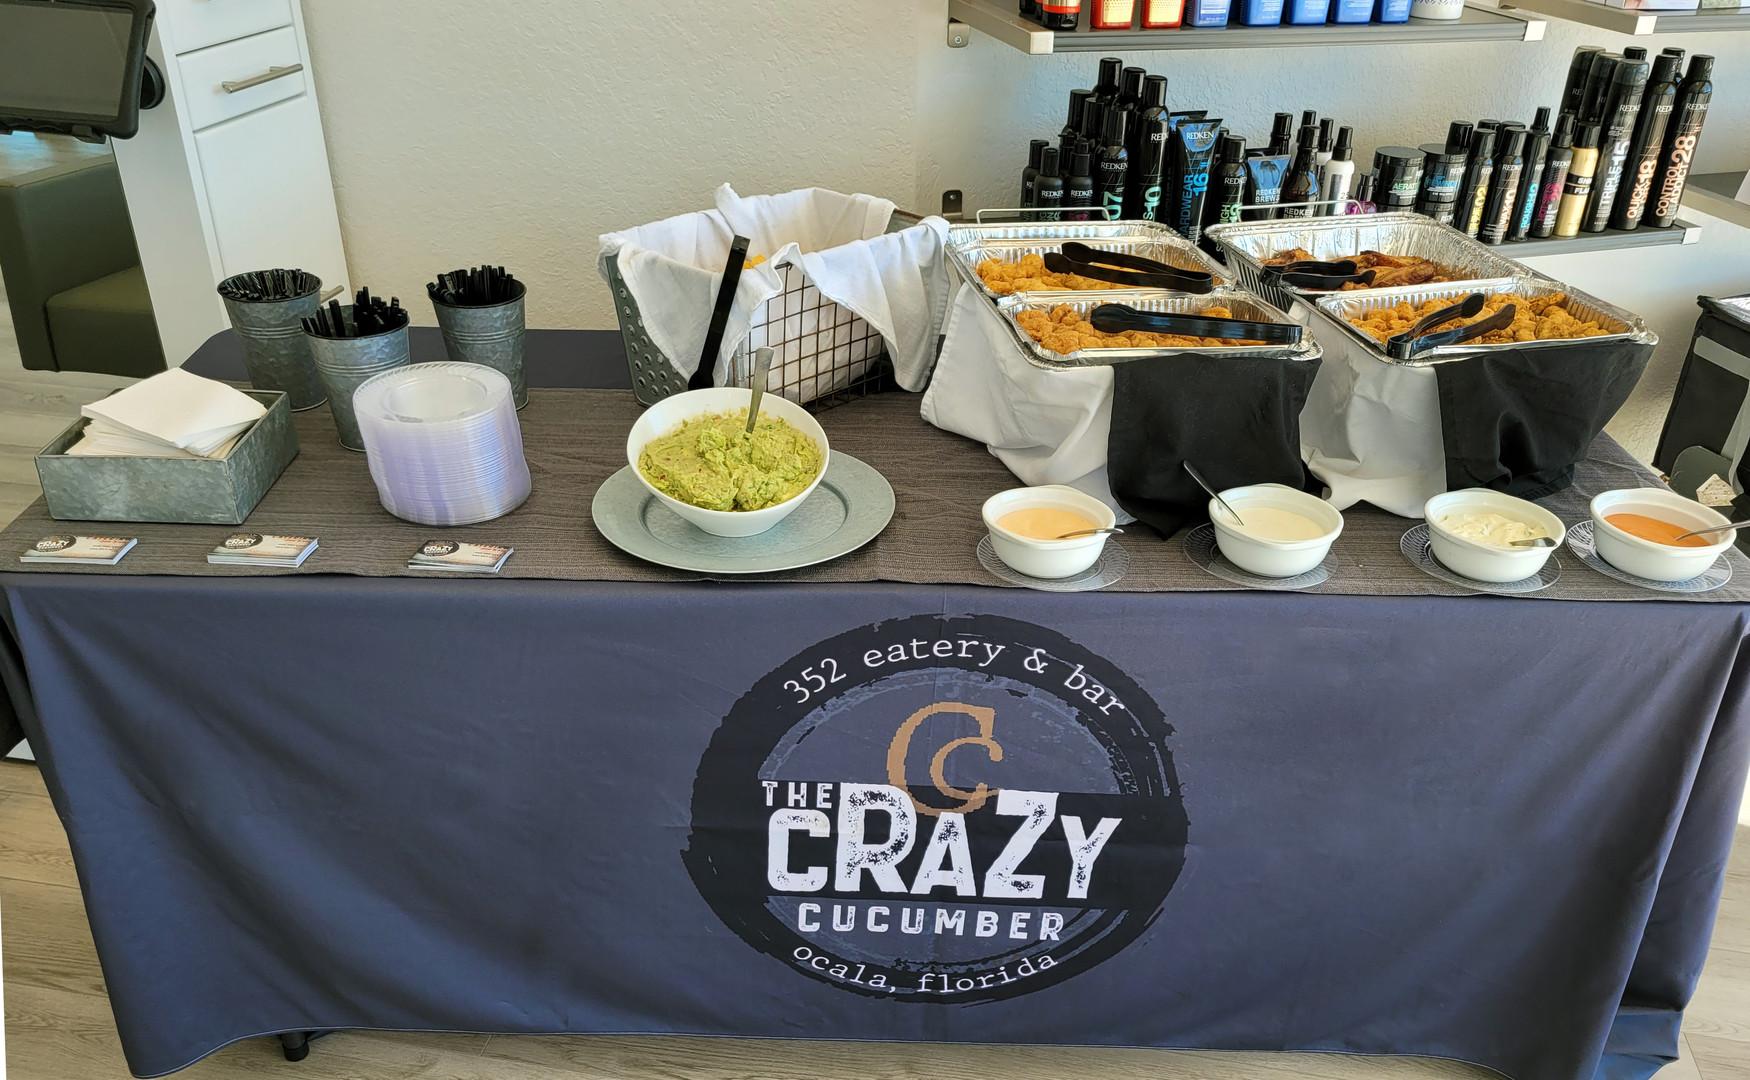 Crazy-Cucumber-Catering4.jpg